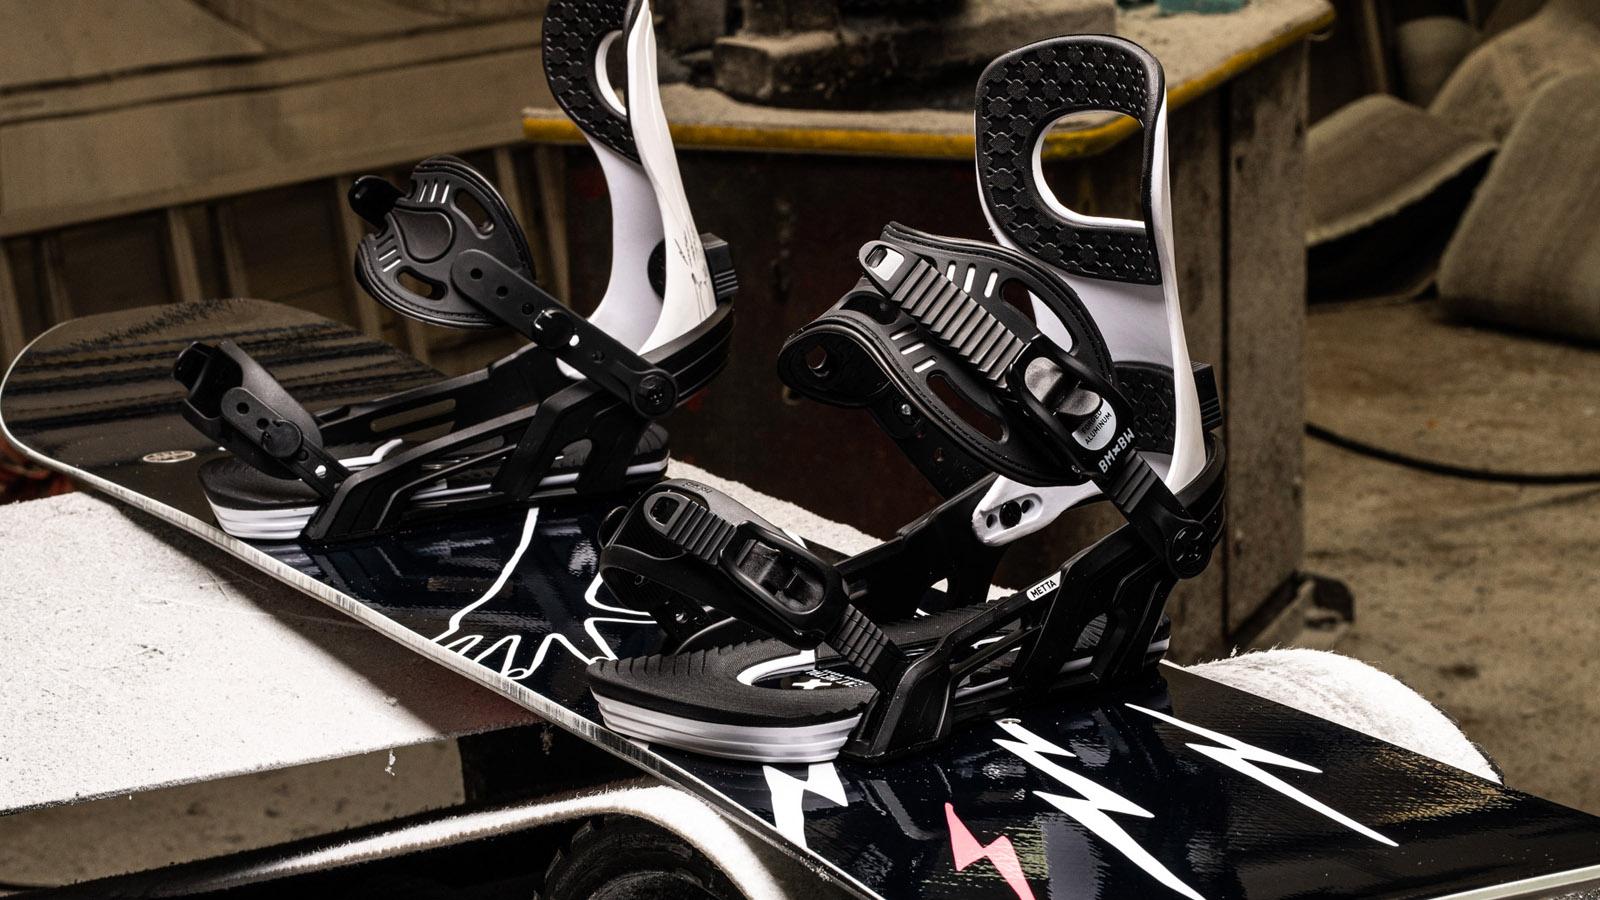 Bent Metal 21/22 Snowboard Bindings